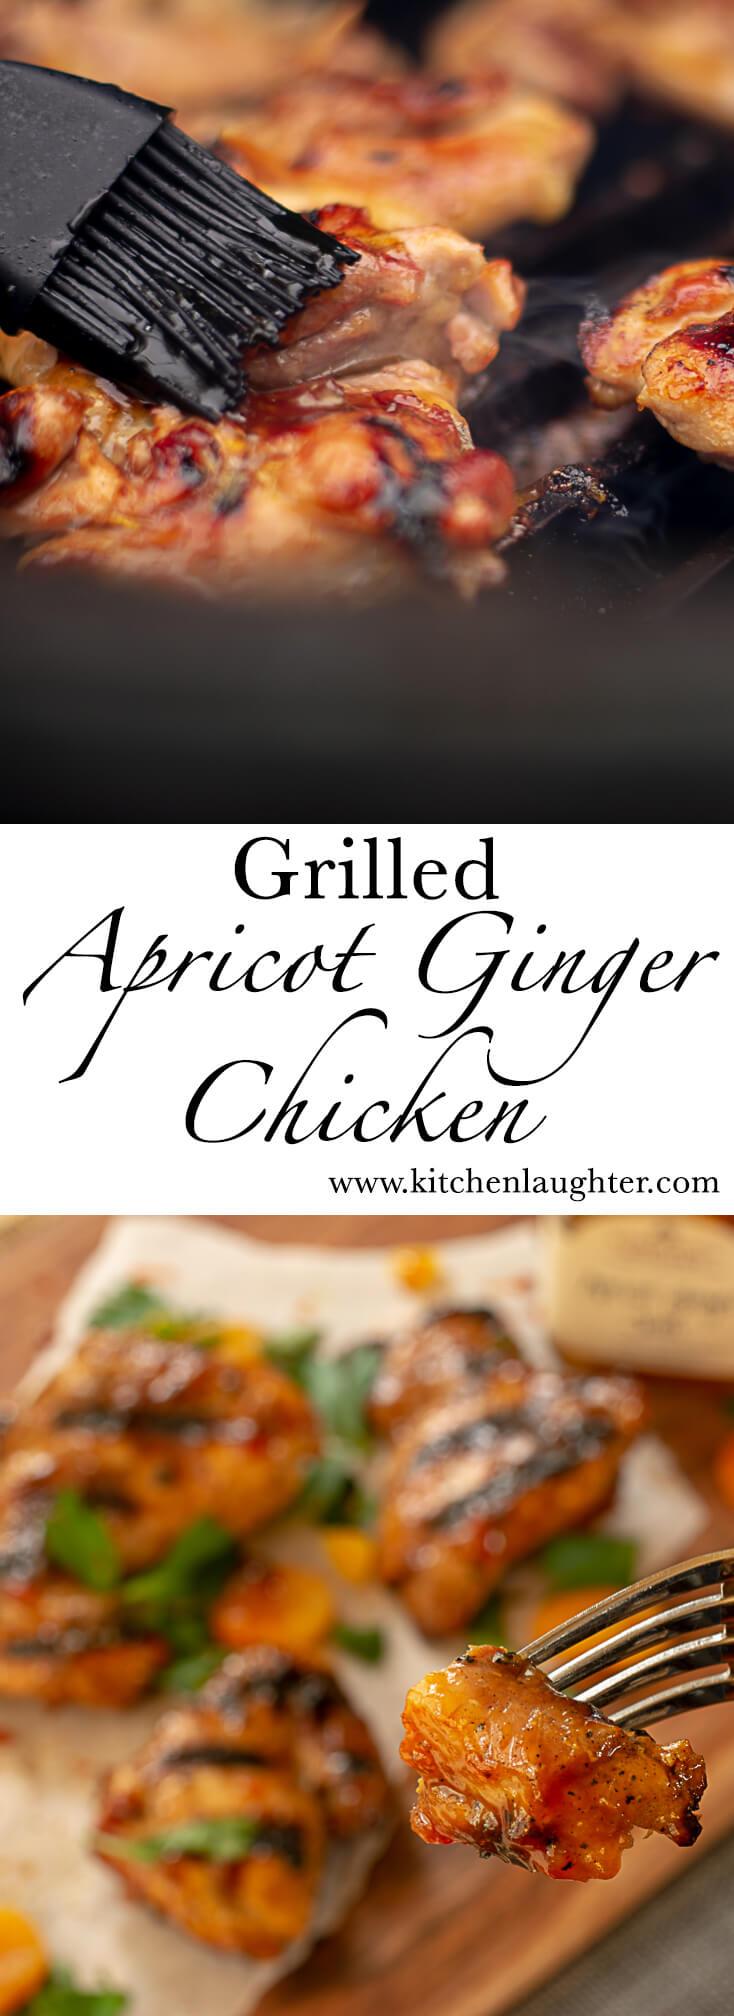 Grilled Apricot Ginger Chicken #BGE #BigGreenEgg #grill #grilling #apricot #bbq #grilledchicken #chicken